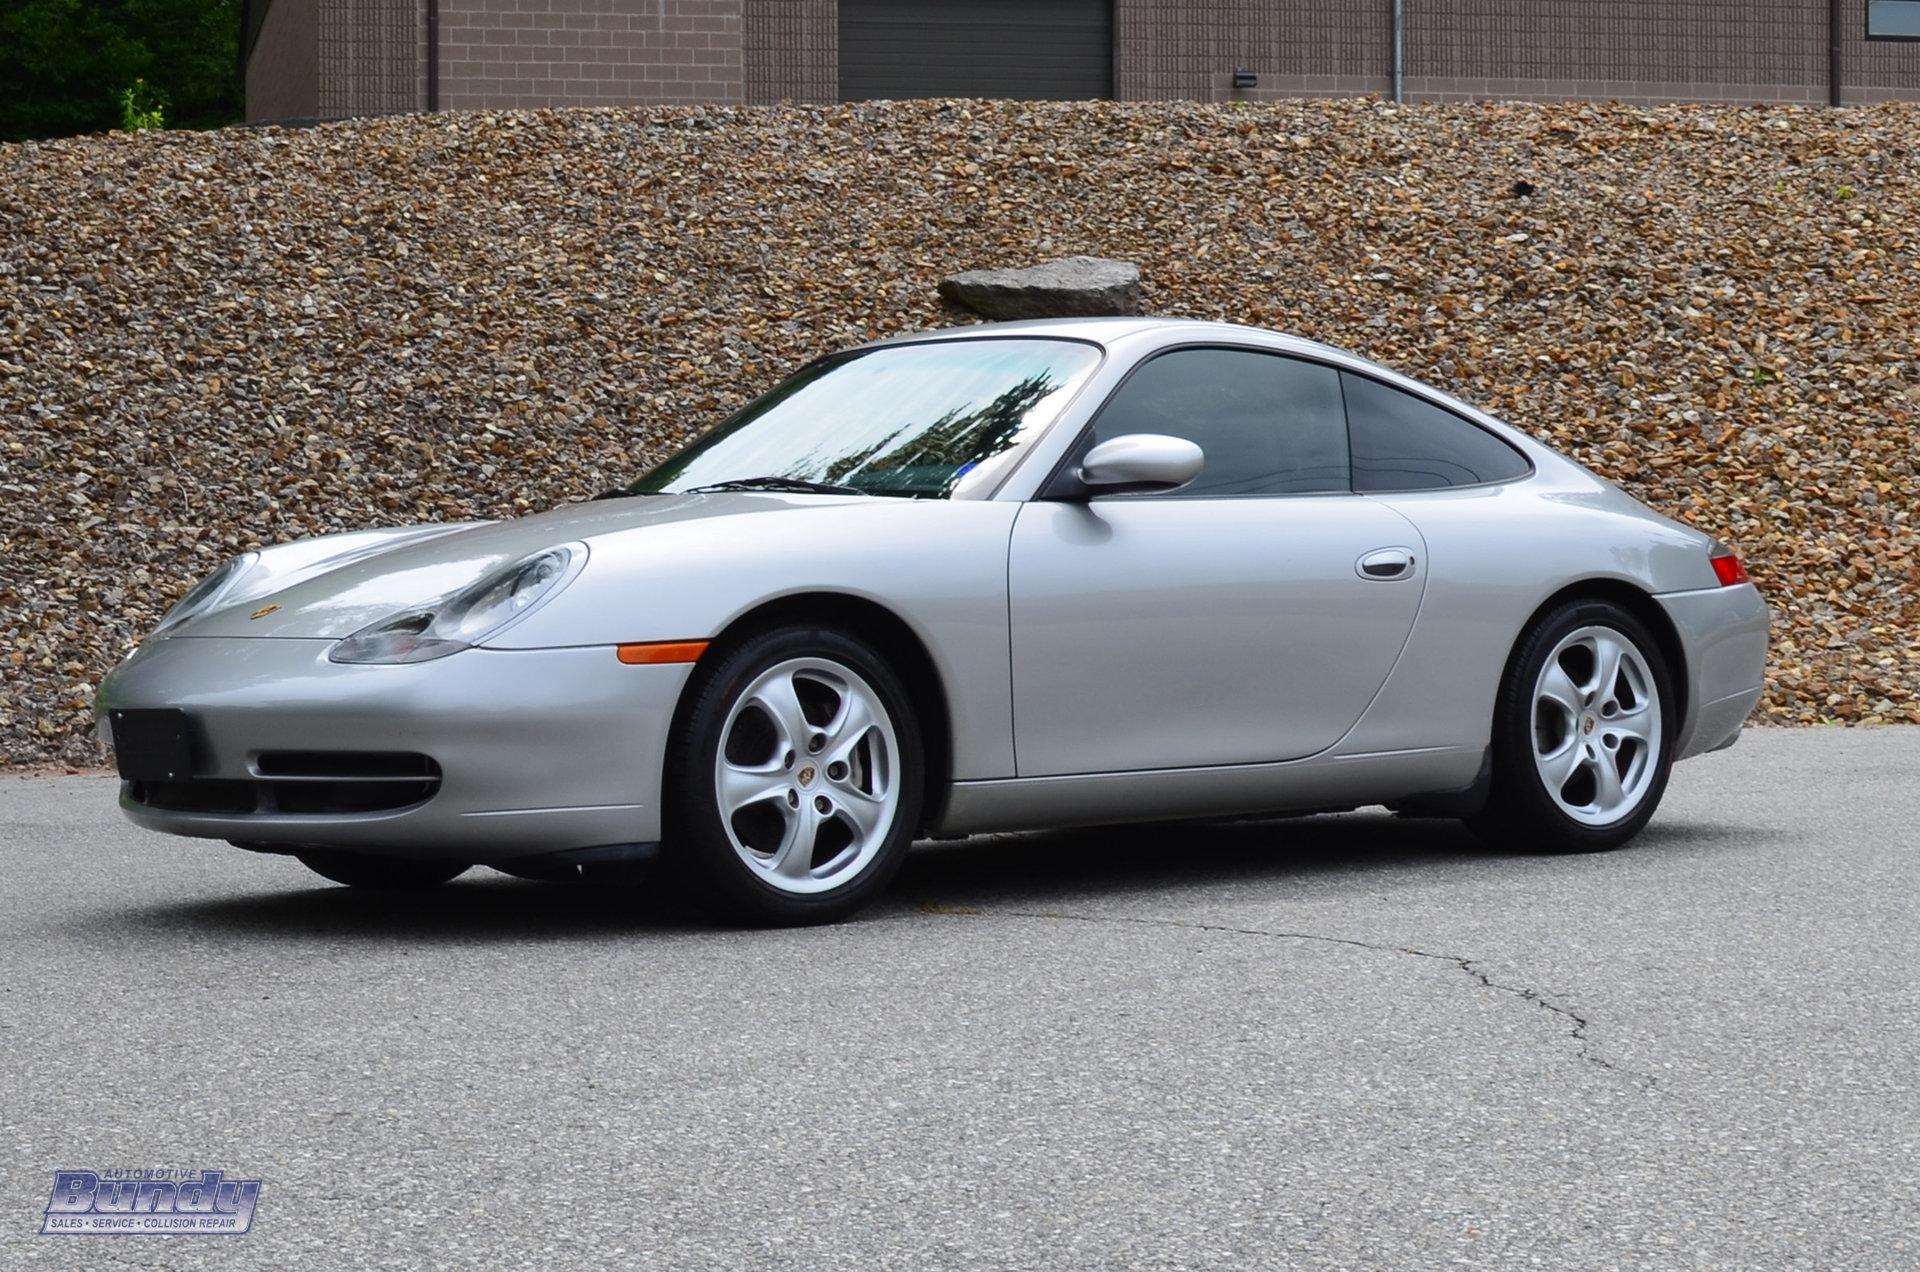 2917f41b014c hd 2000 porsche 911 carrera 2dr carrera cpe 6 spd manual